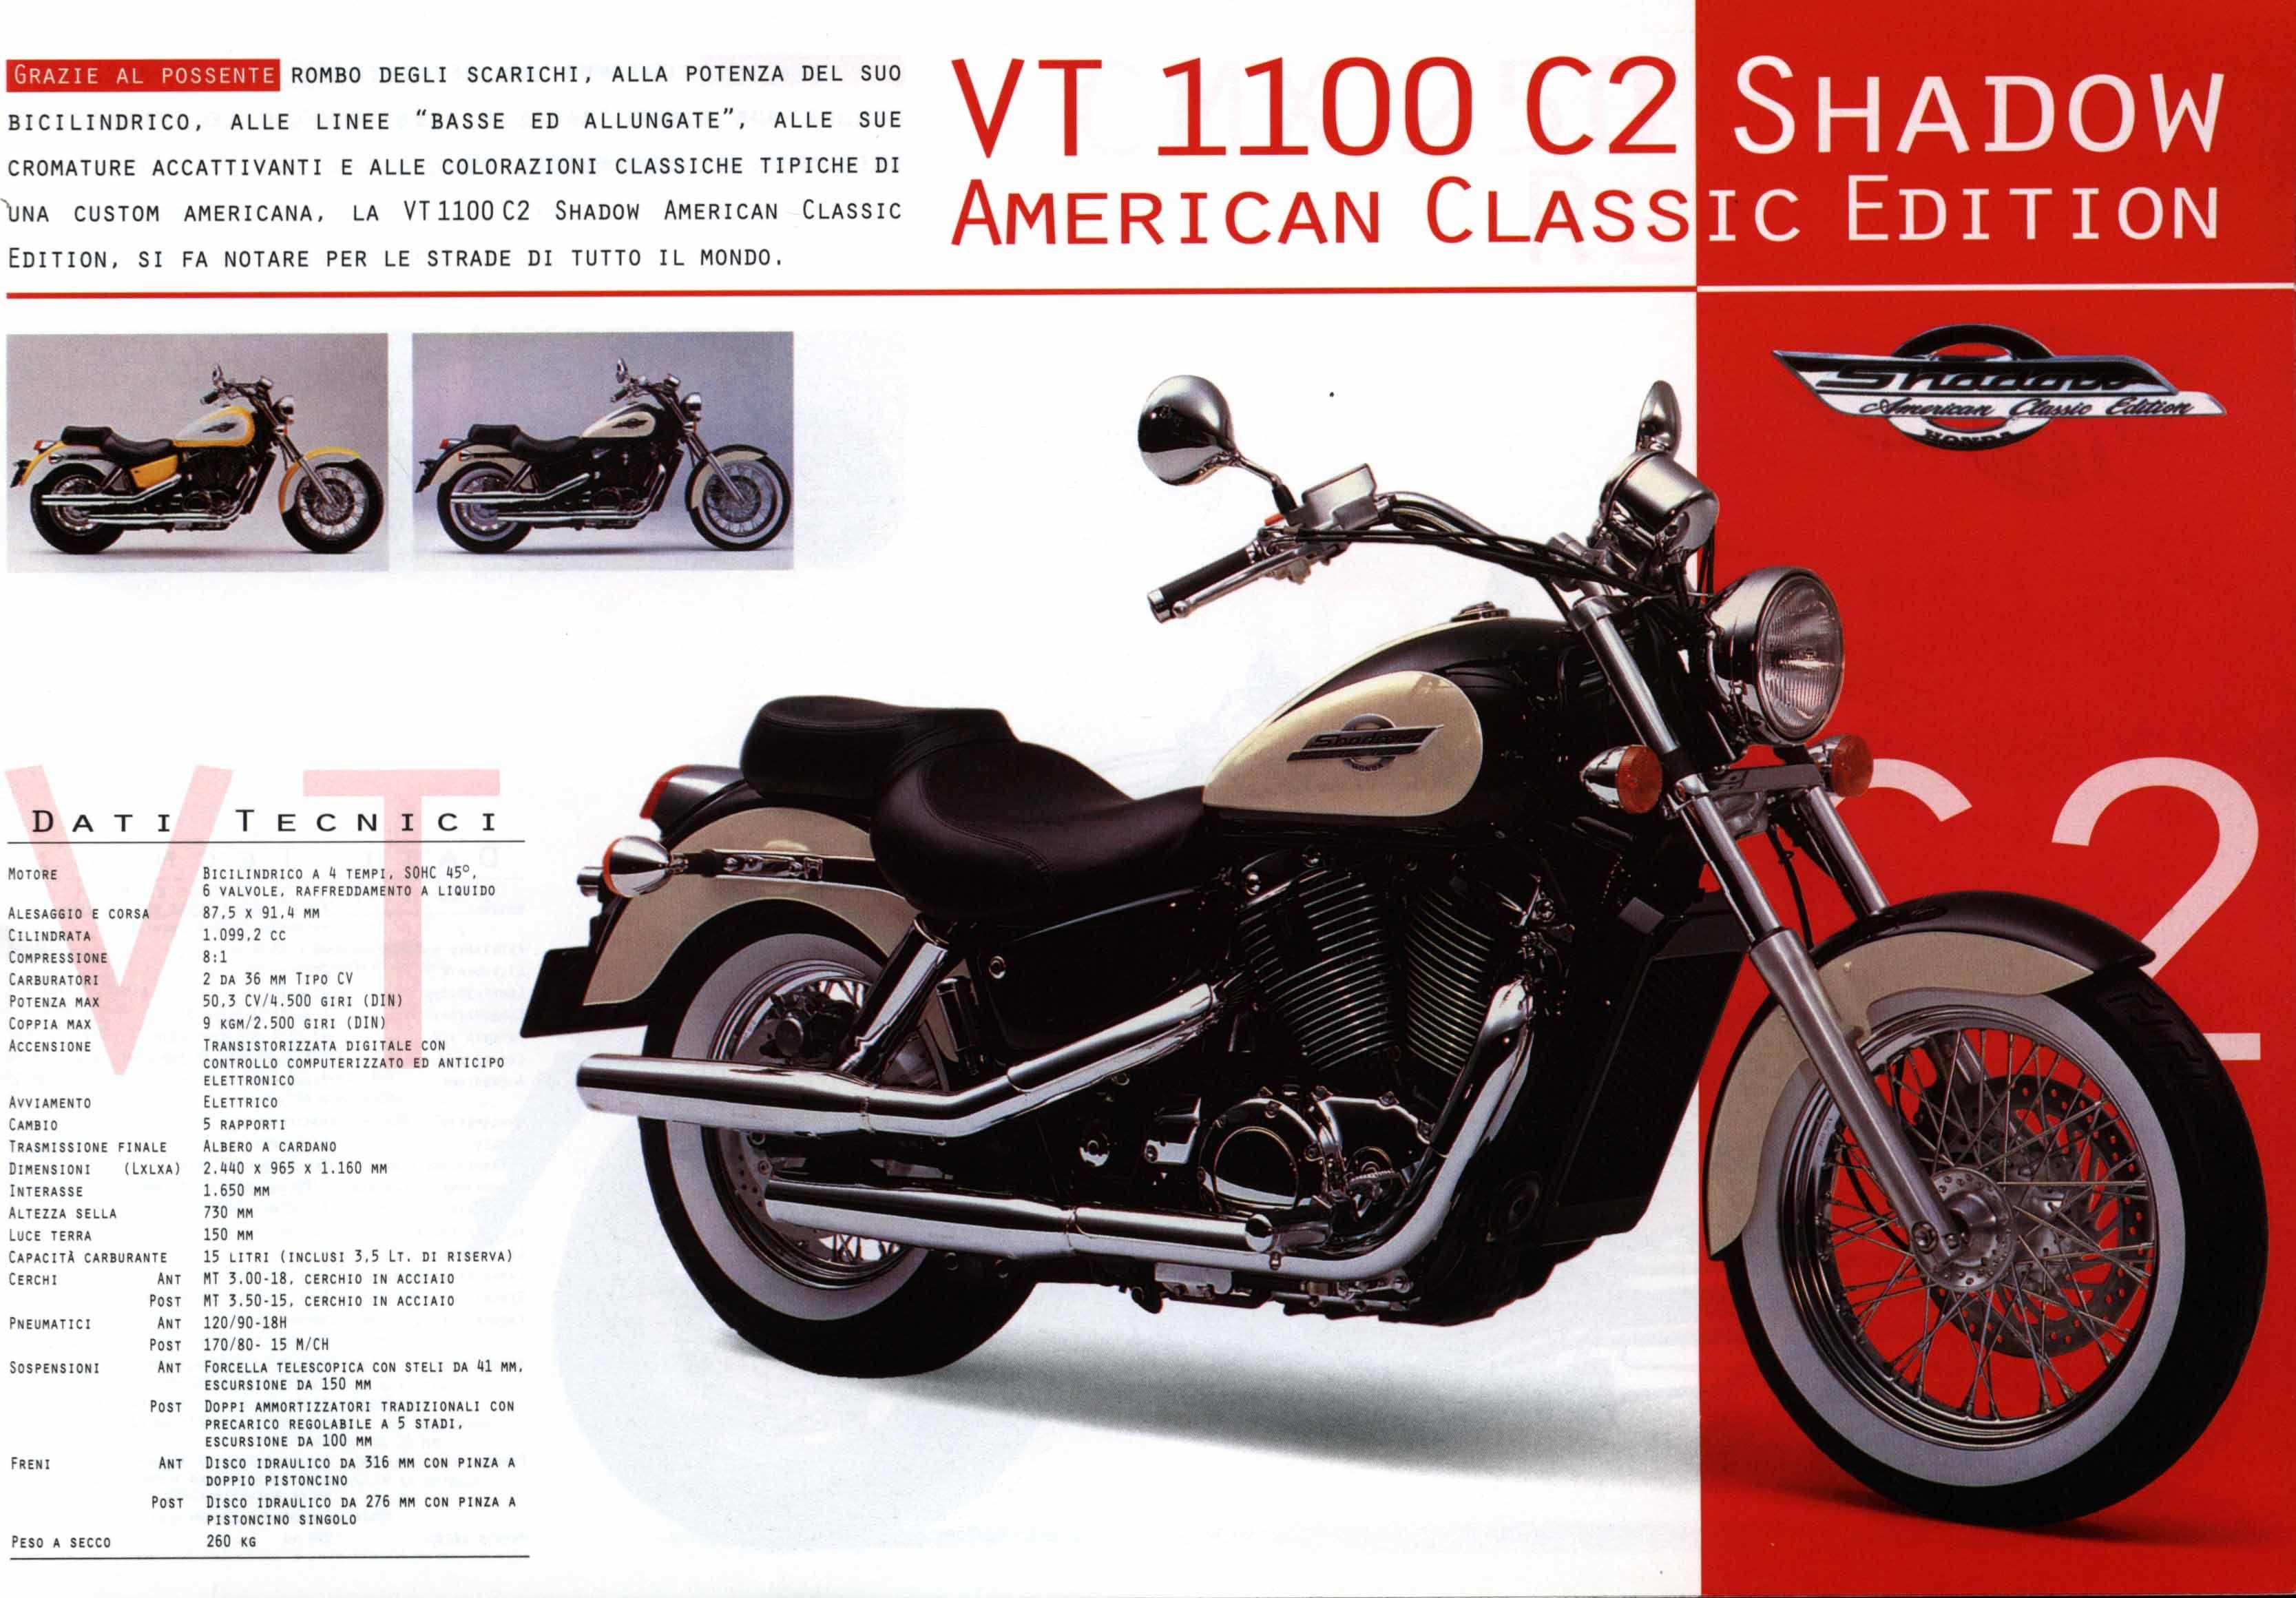 medium resolution of honda vt1100 c2 shadow american classic edition brochure